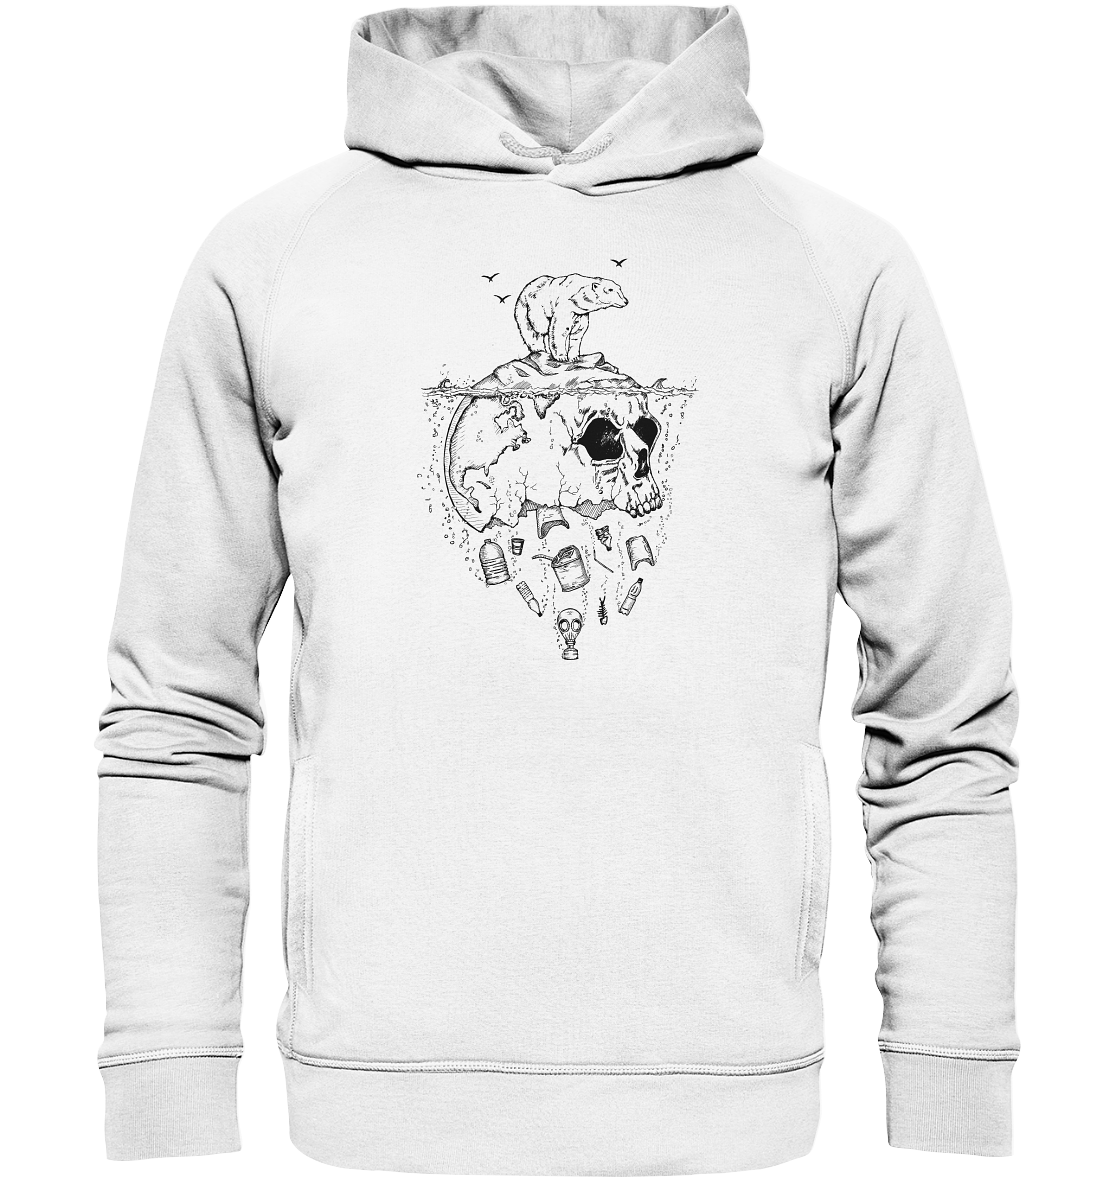 front-organic-fashion-hoodie-f8f8f8-1116x-3.png